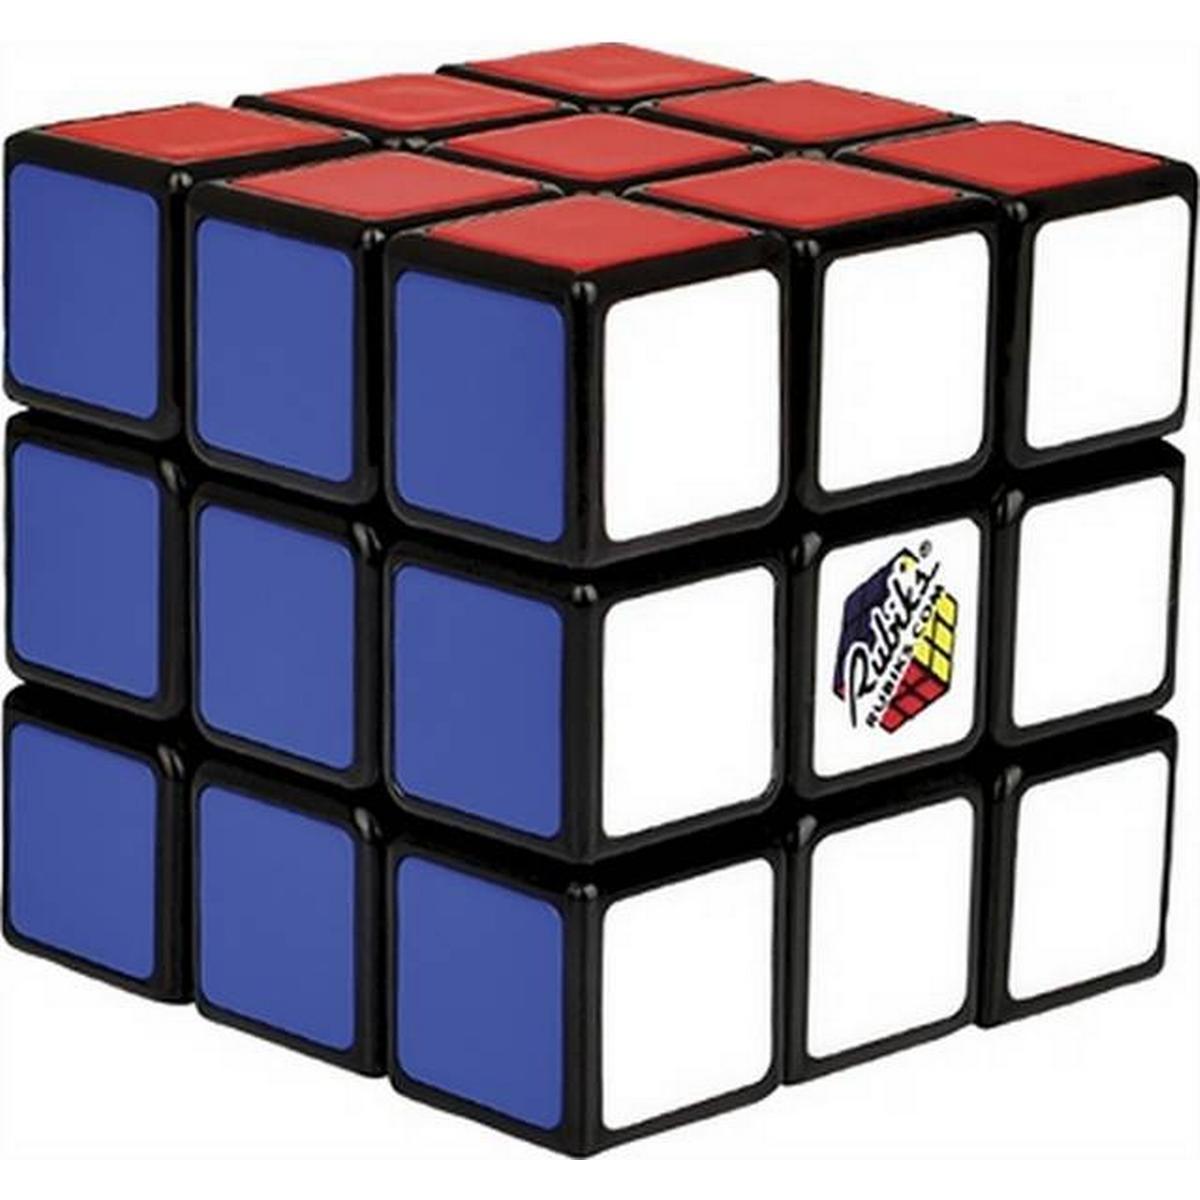 YongJun 3x3x3 Professional Speed Magic Cube Ultra-smooth Puzzle Twist Toy Hot JR